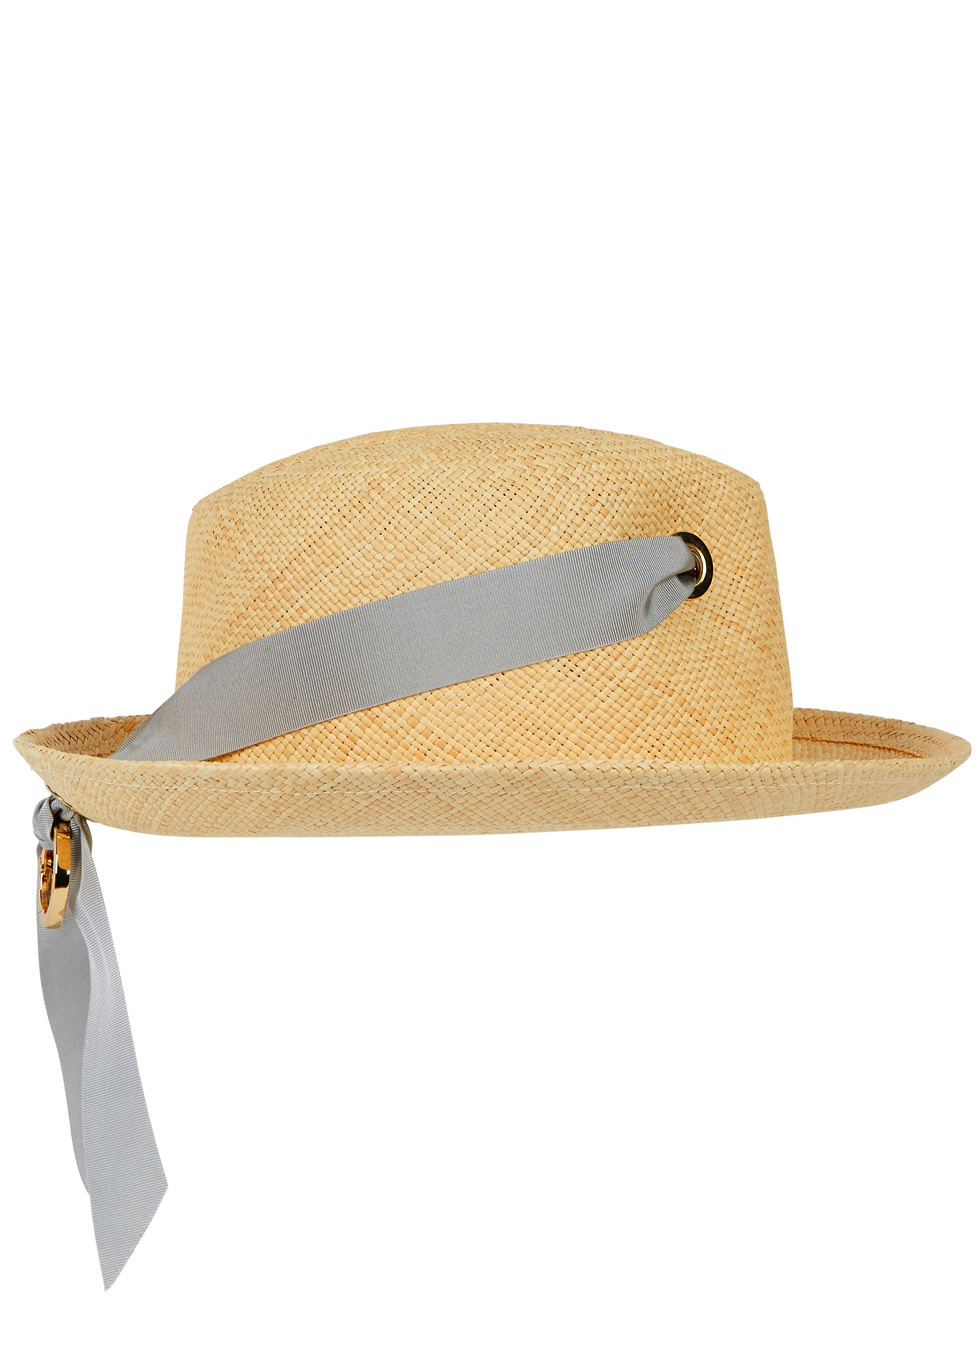 Sand straw panama hat - Federica Moretti